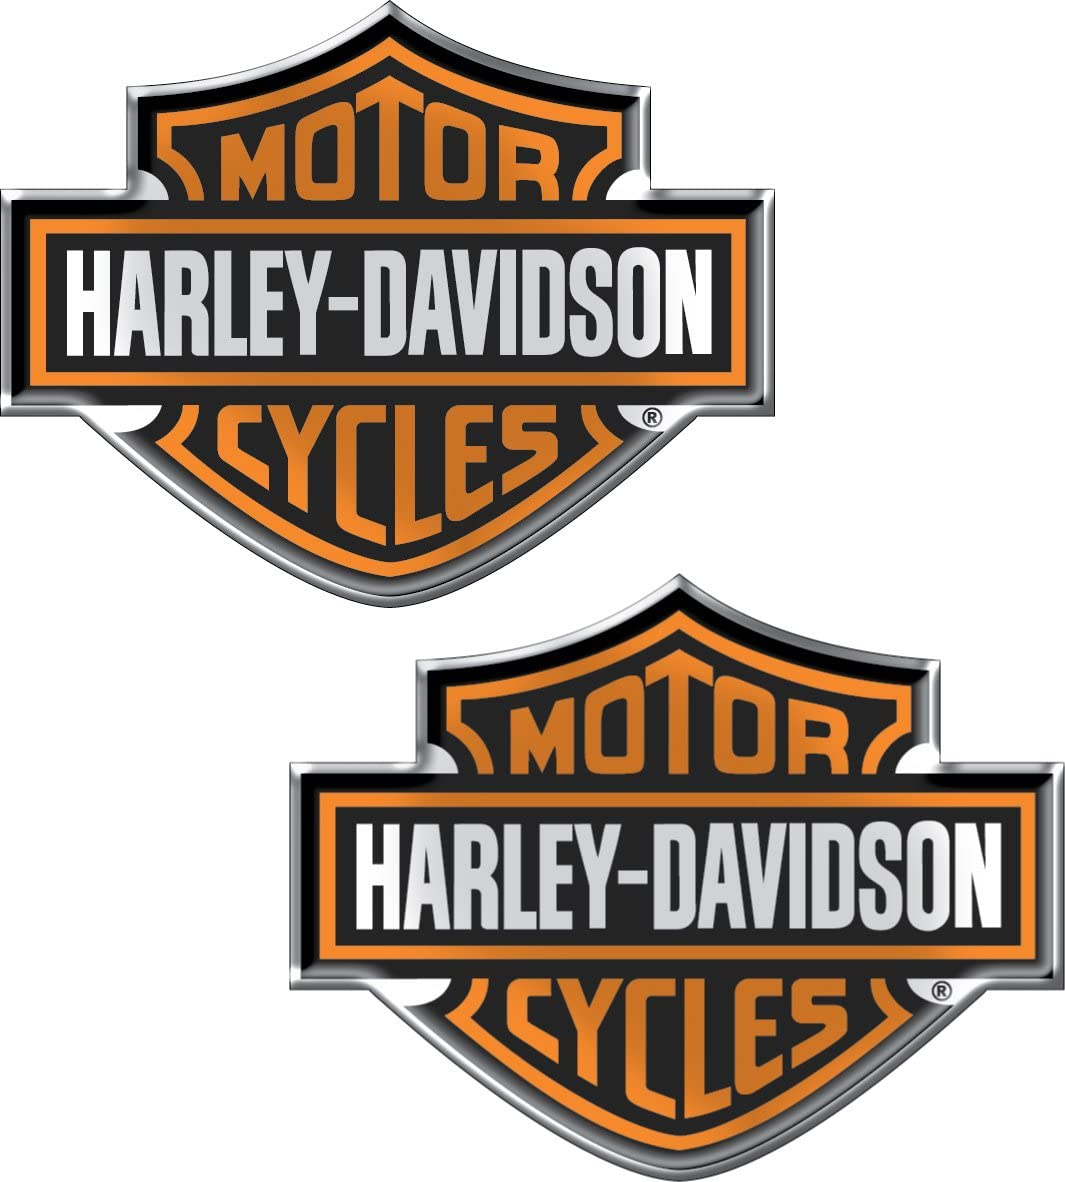 Chroma 5507 Harley-Davidson Domed Emblem Decal One Size